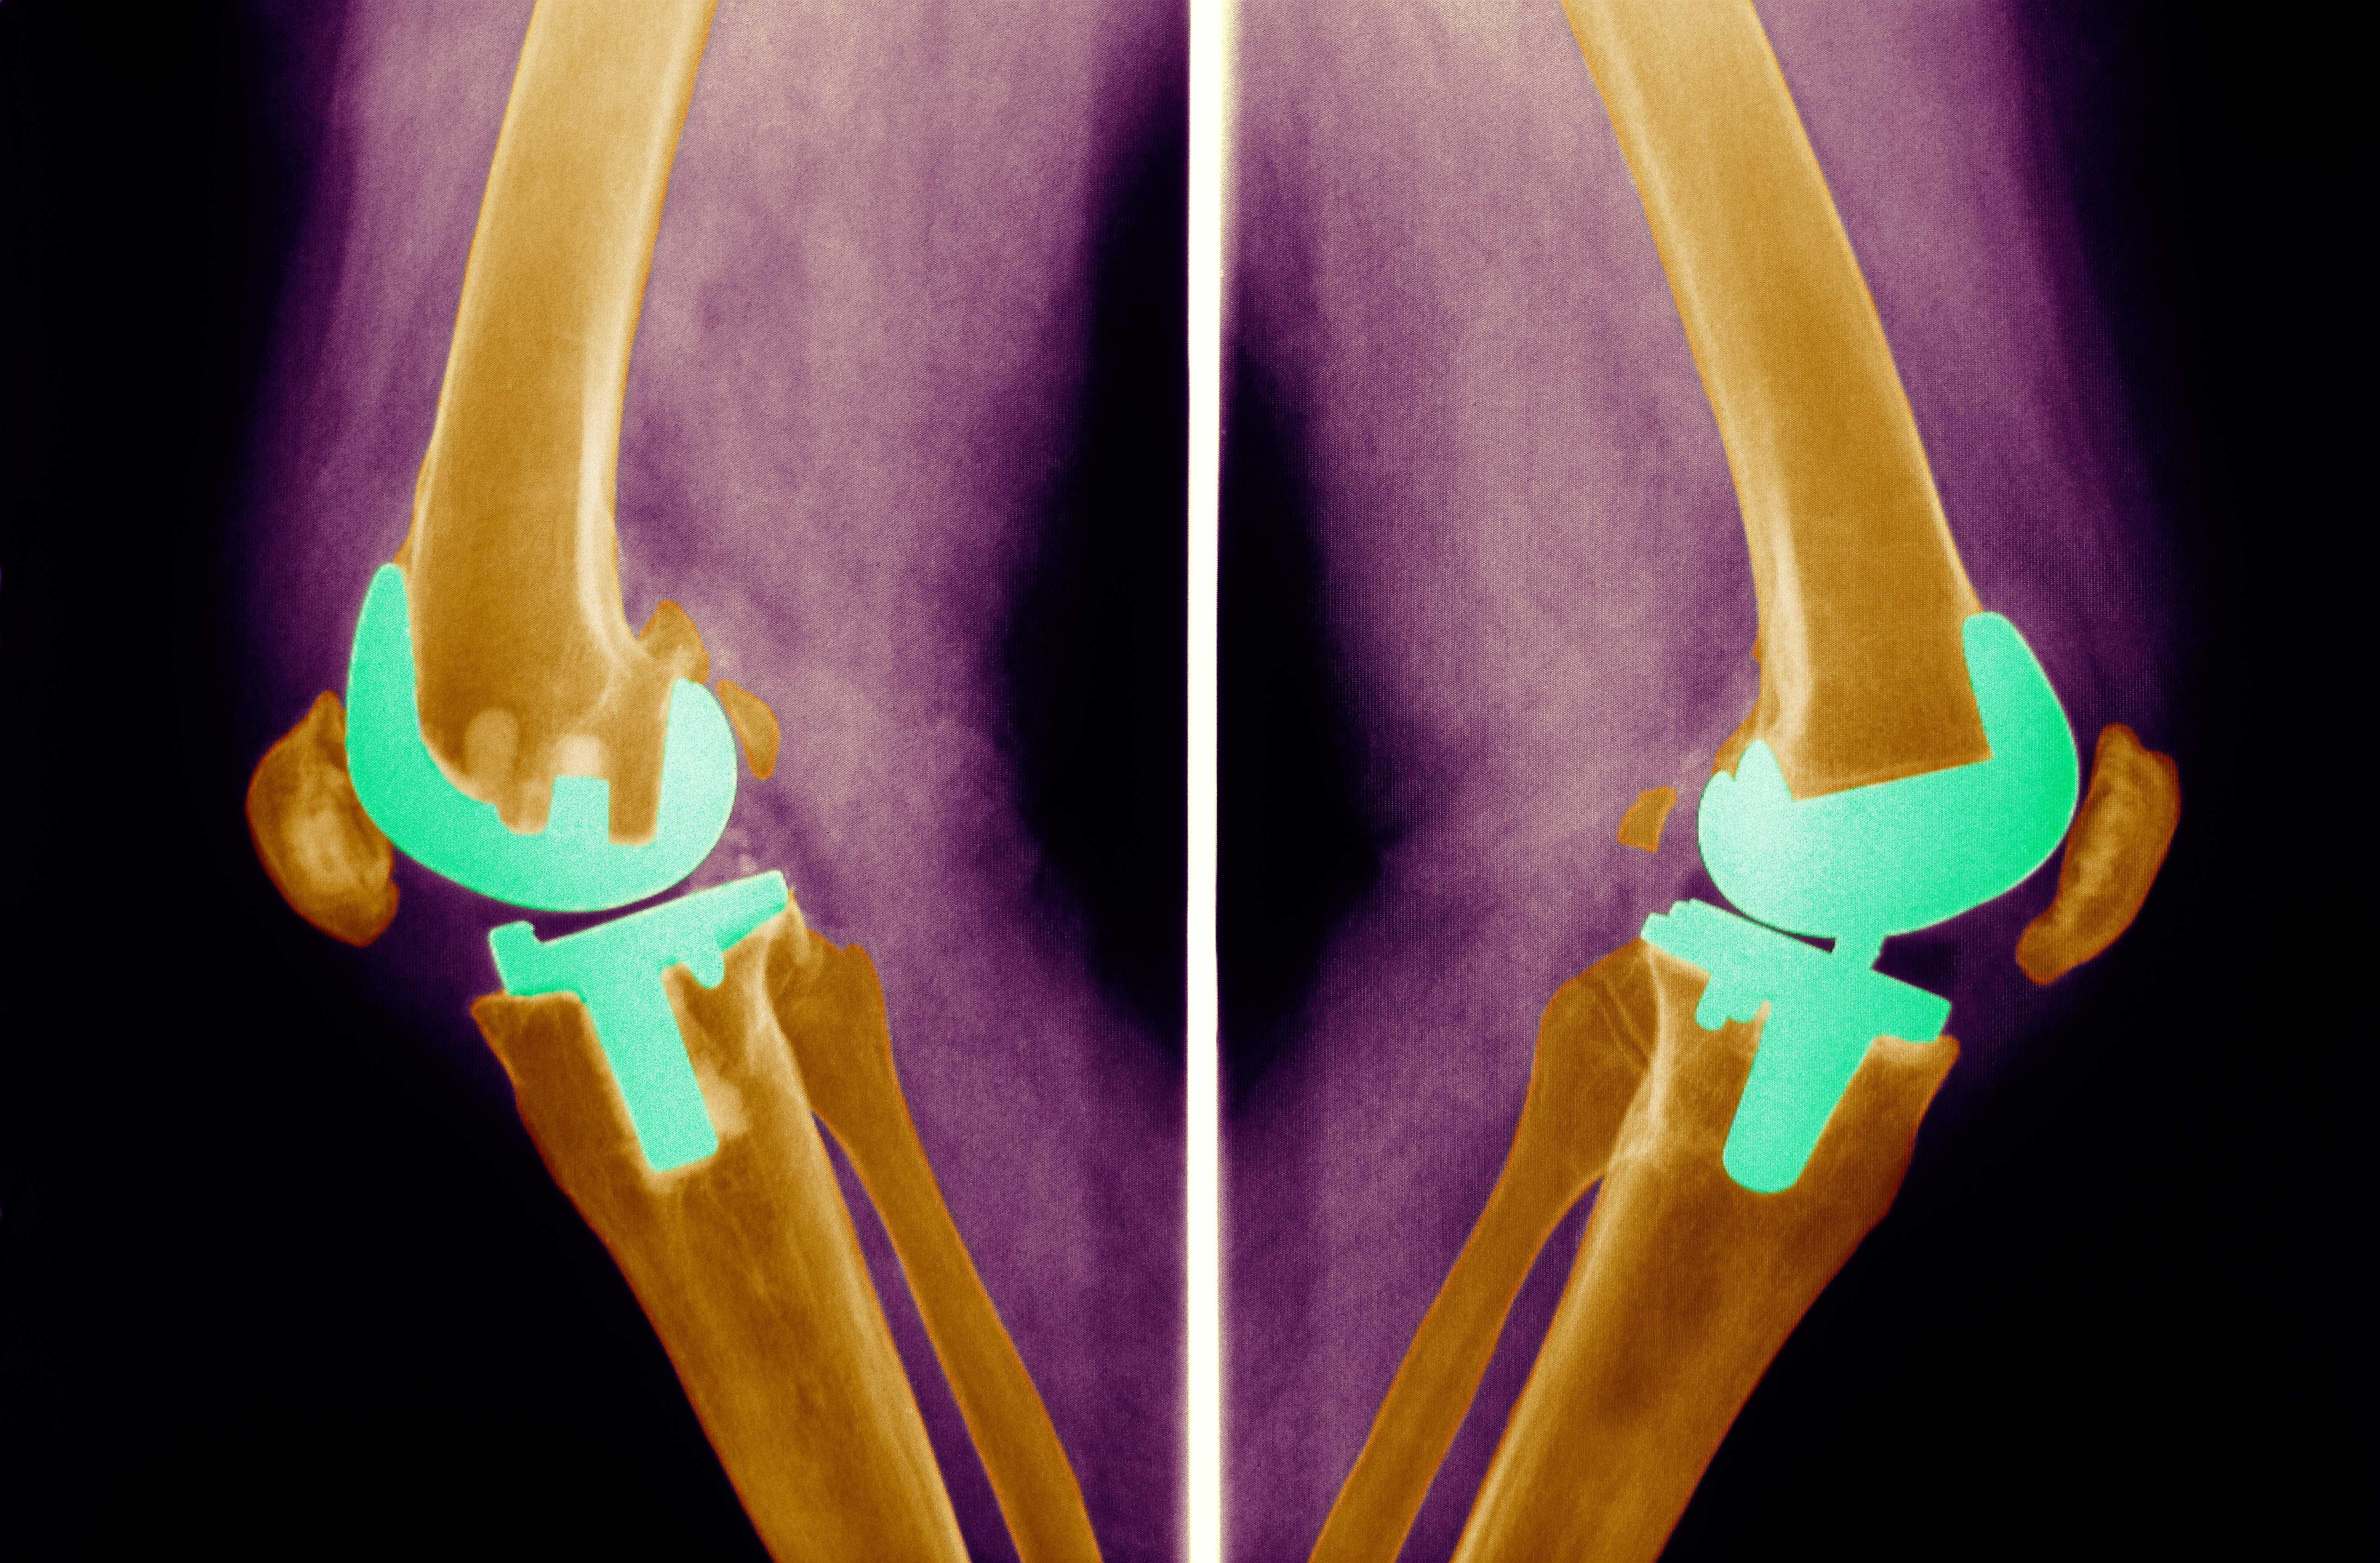 Knee Prosthesis, X-Ray